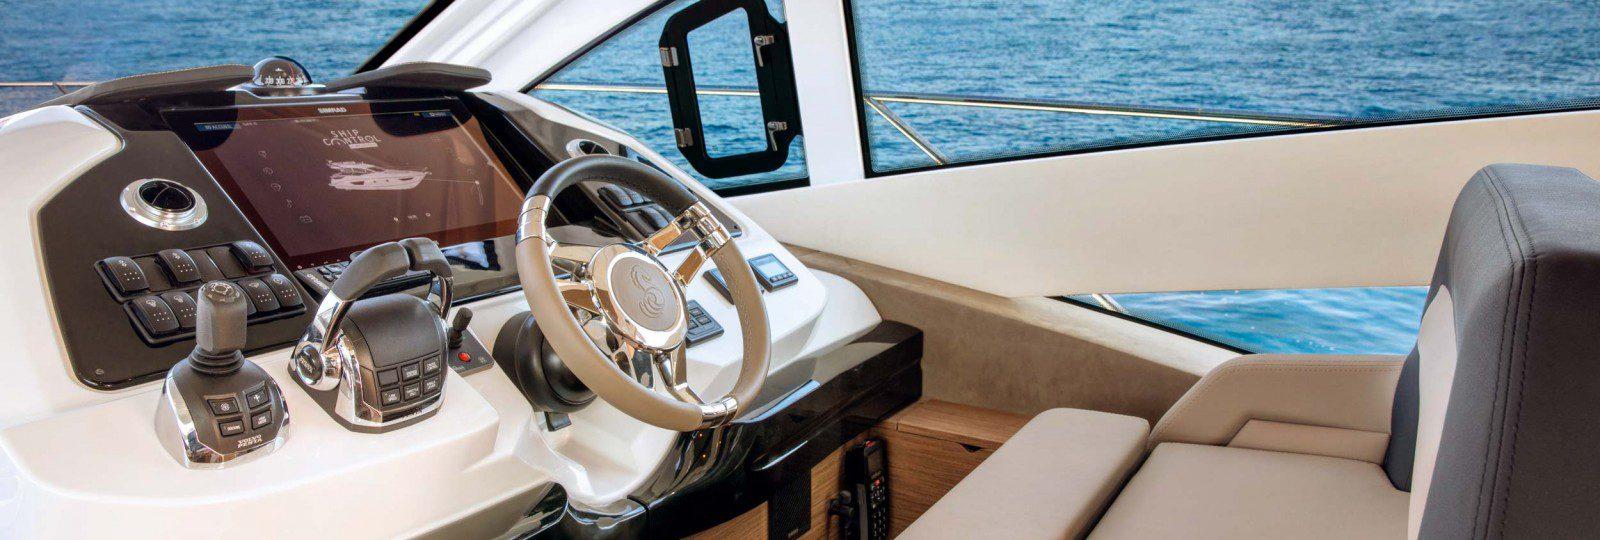 Beneteau Gran Turismo 50 Sportfly helm